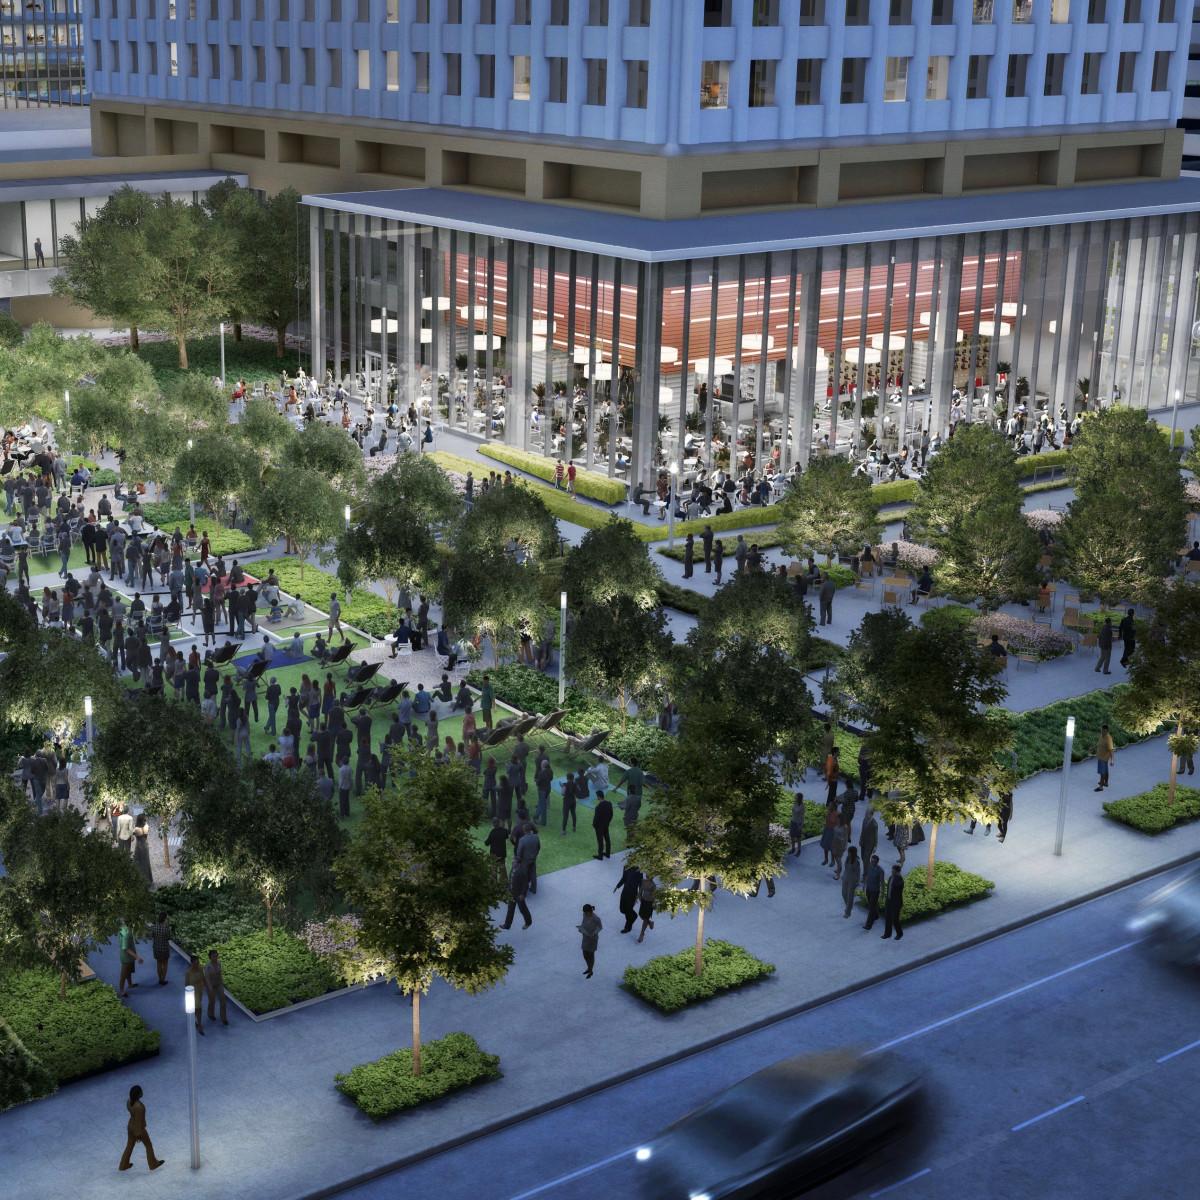 One Allen Center new green space